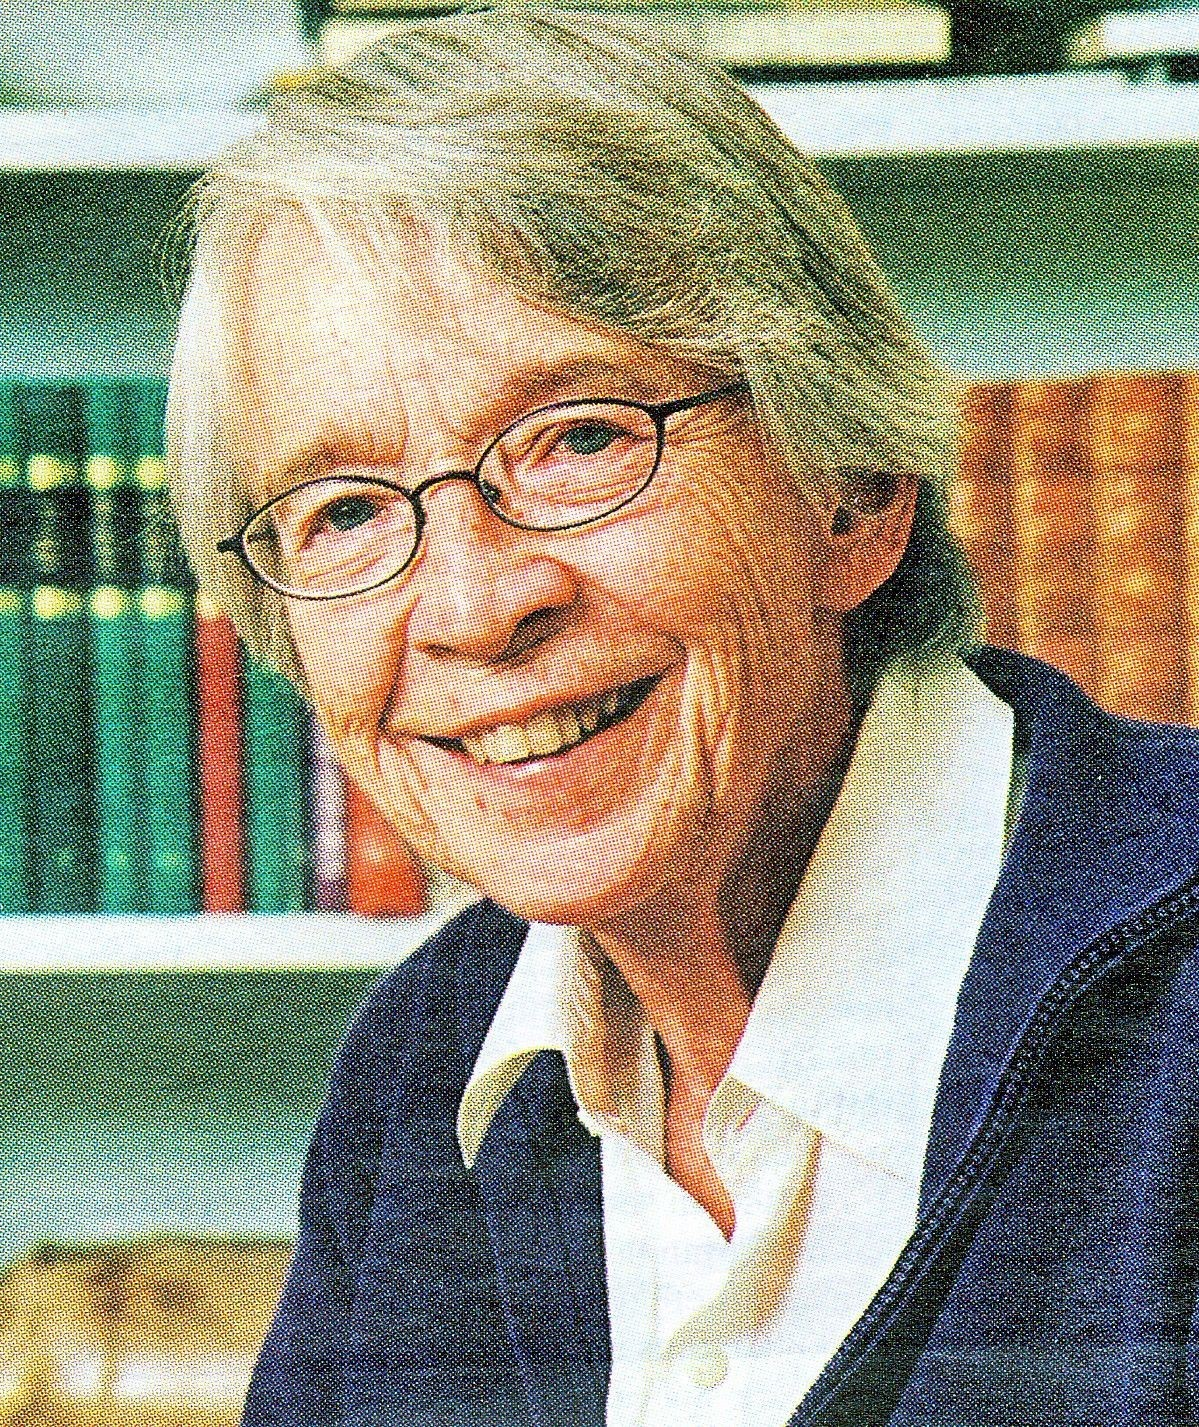 Kajsa Sundström, 2001. Fotograf okänd (bild i privat ägo)